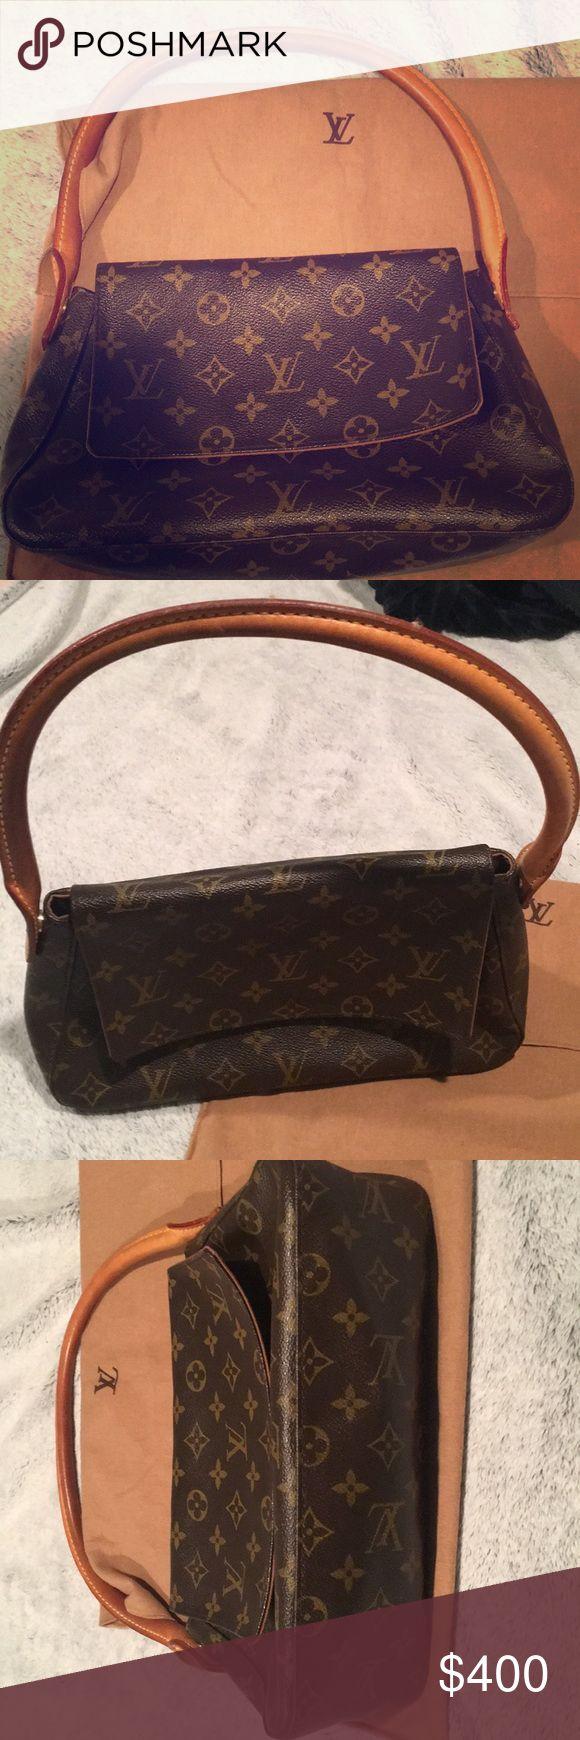 Authentic Louis Vuitton mini loop shoulder bag Excellent condition. Only wear is shown in last photo. Authentic. Louis Vuitton Bags Shoulder Bags